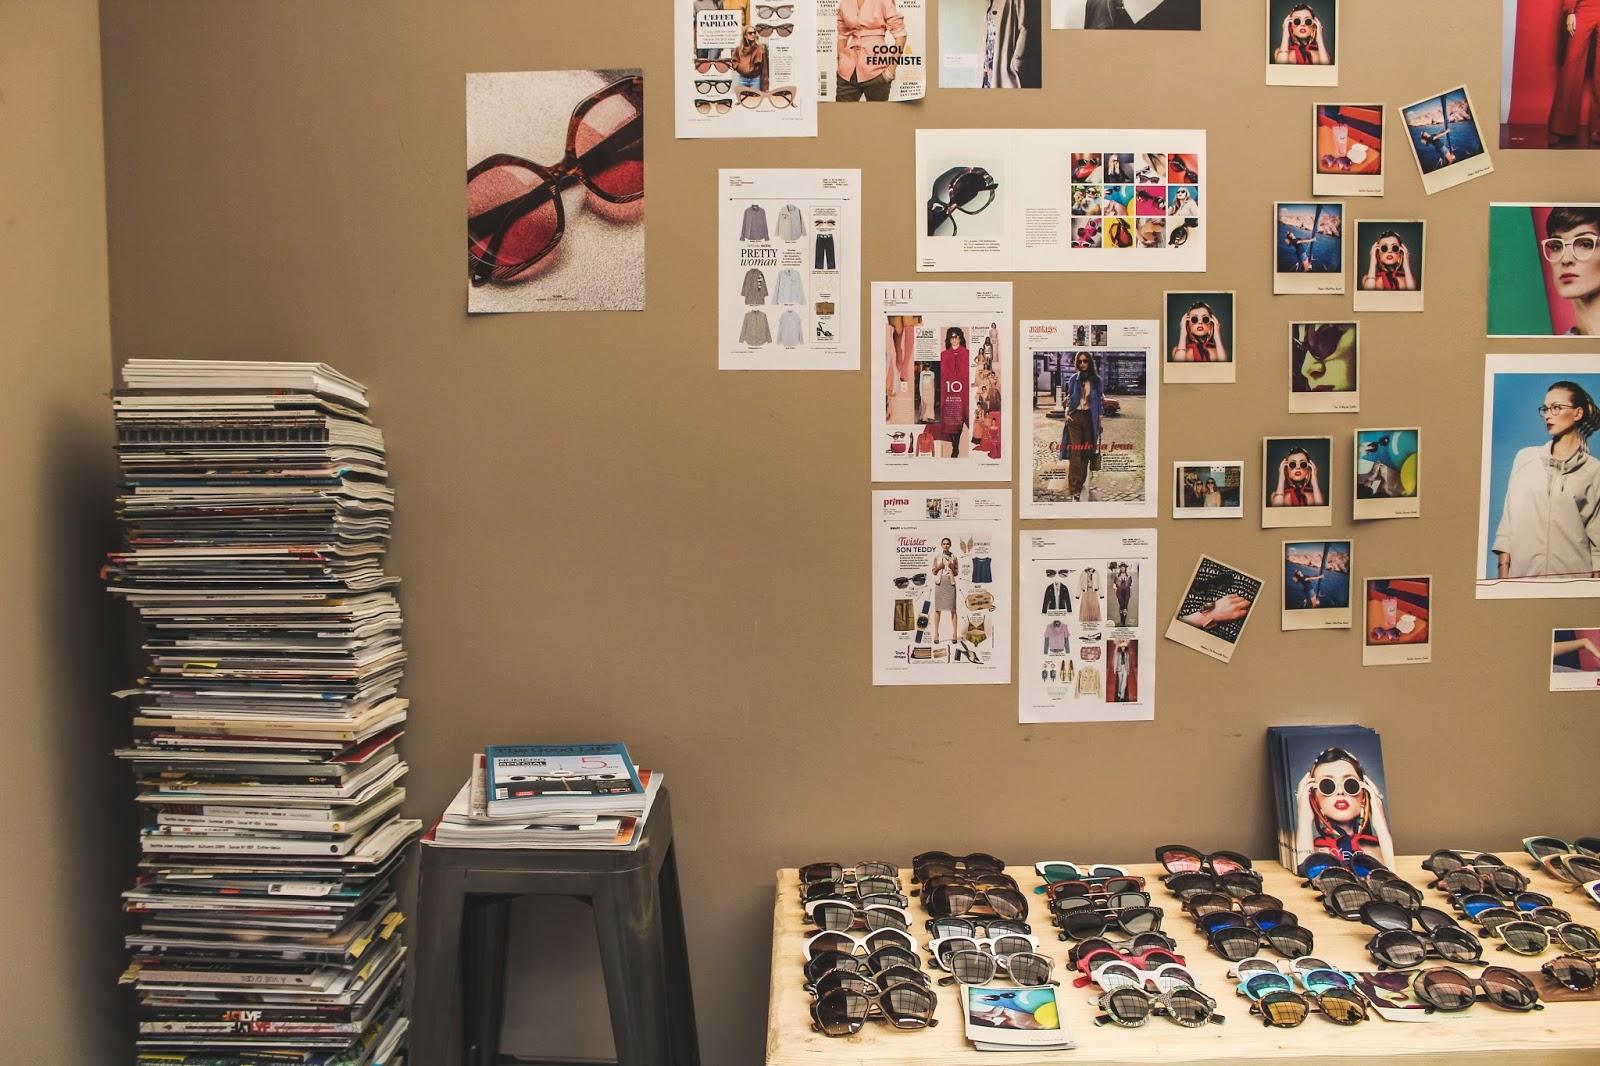 jean françois rey showroom